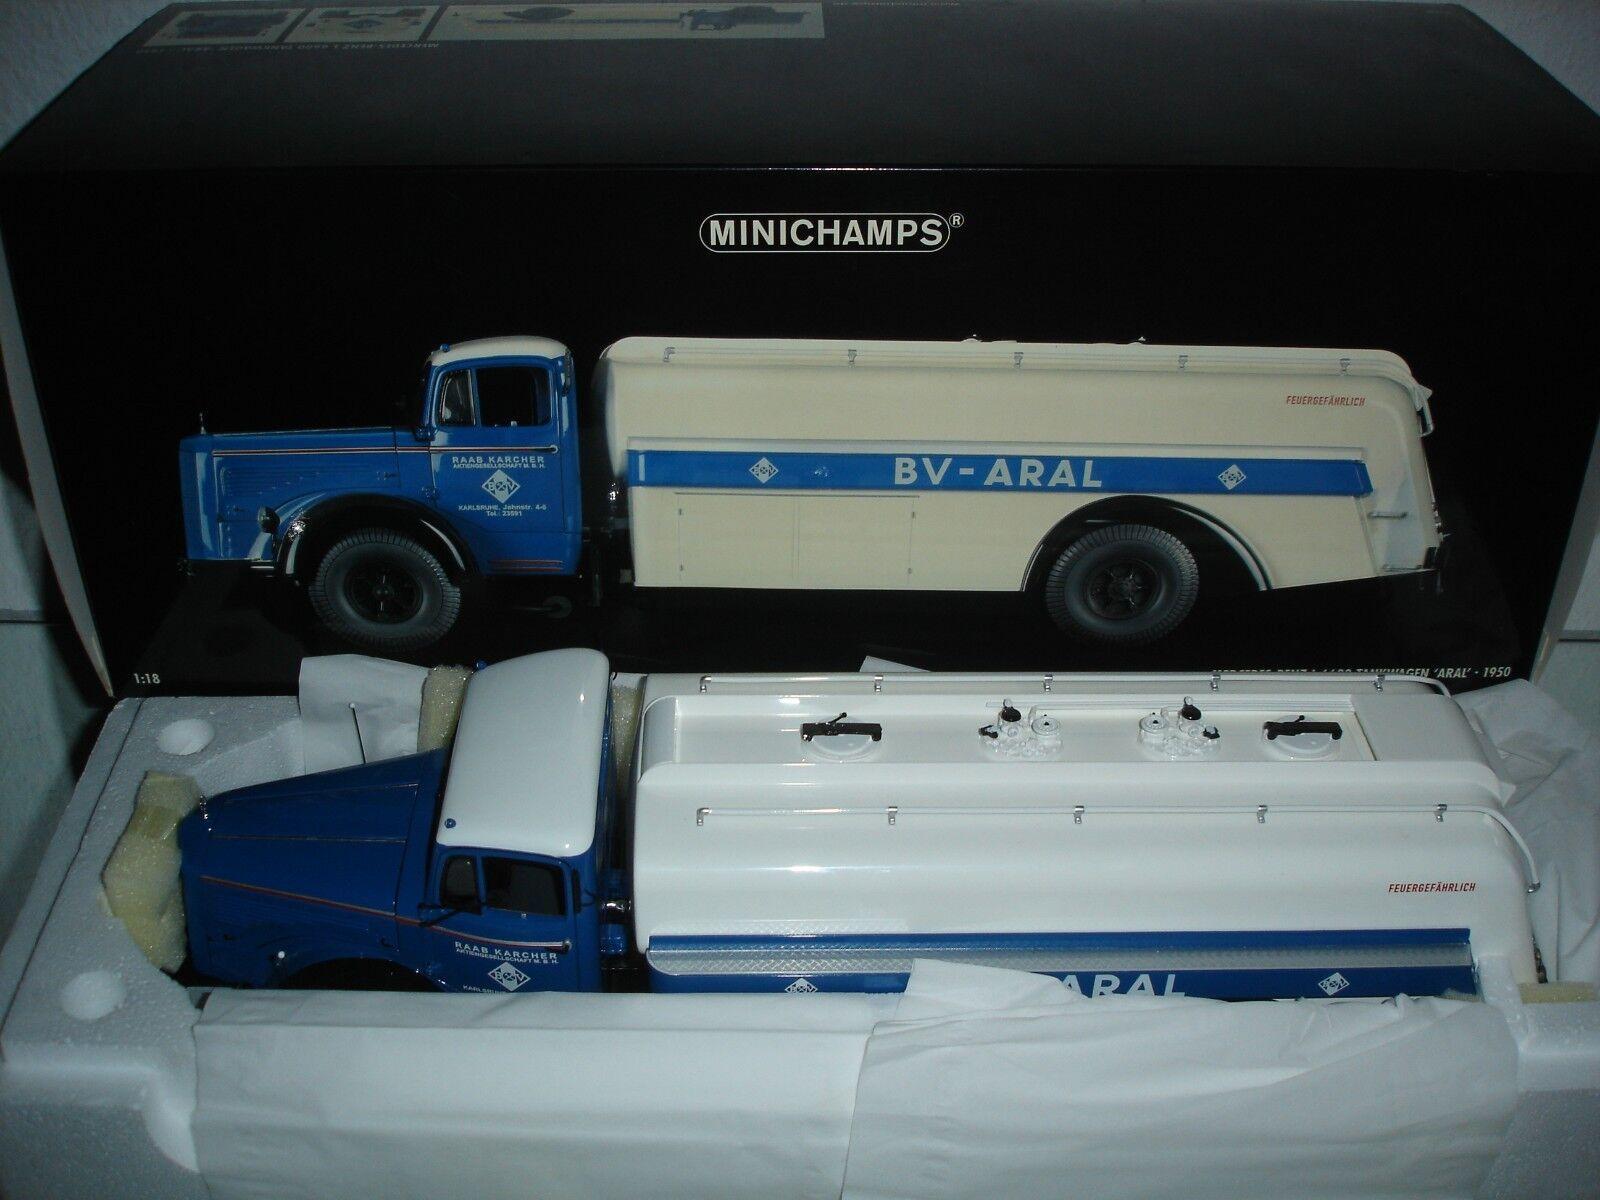 Minichamps 1 18 MERCEDES BENZ L 6600 autocisterna Aral 1950 NUOVO